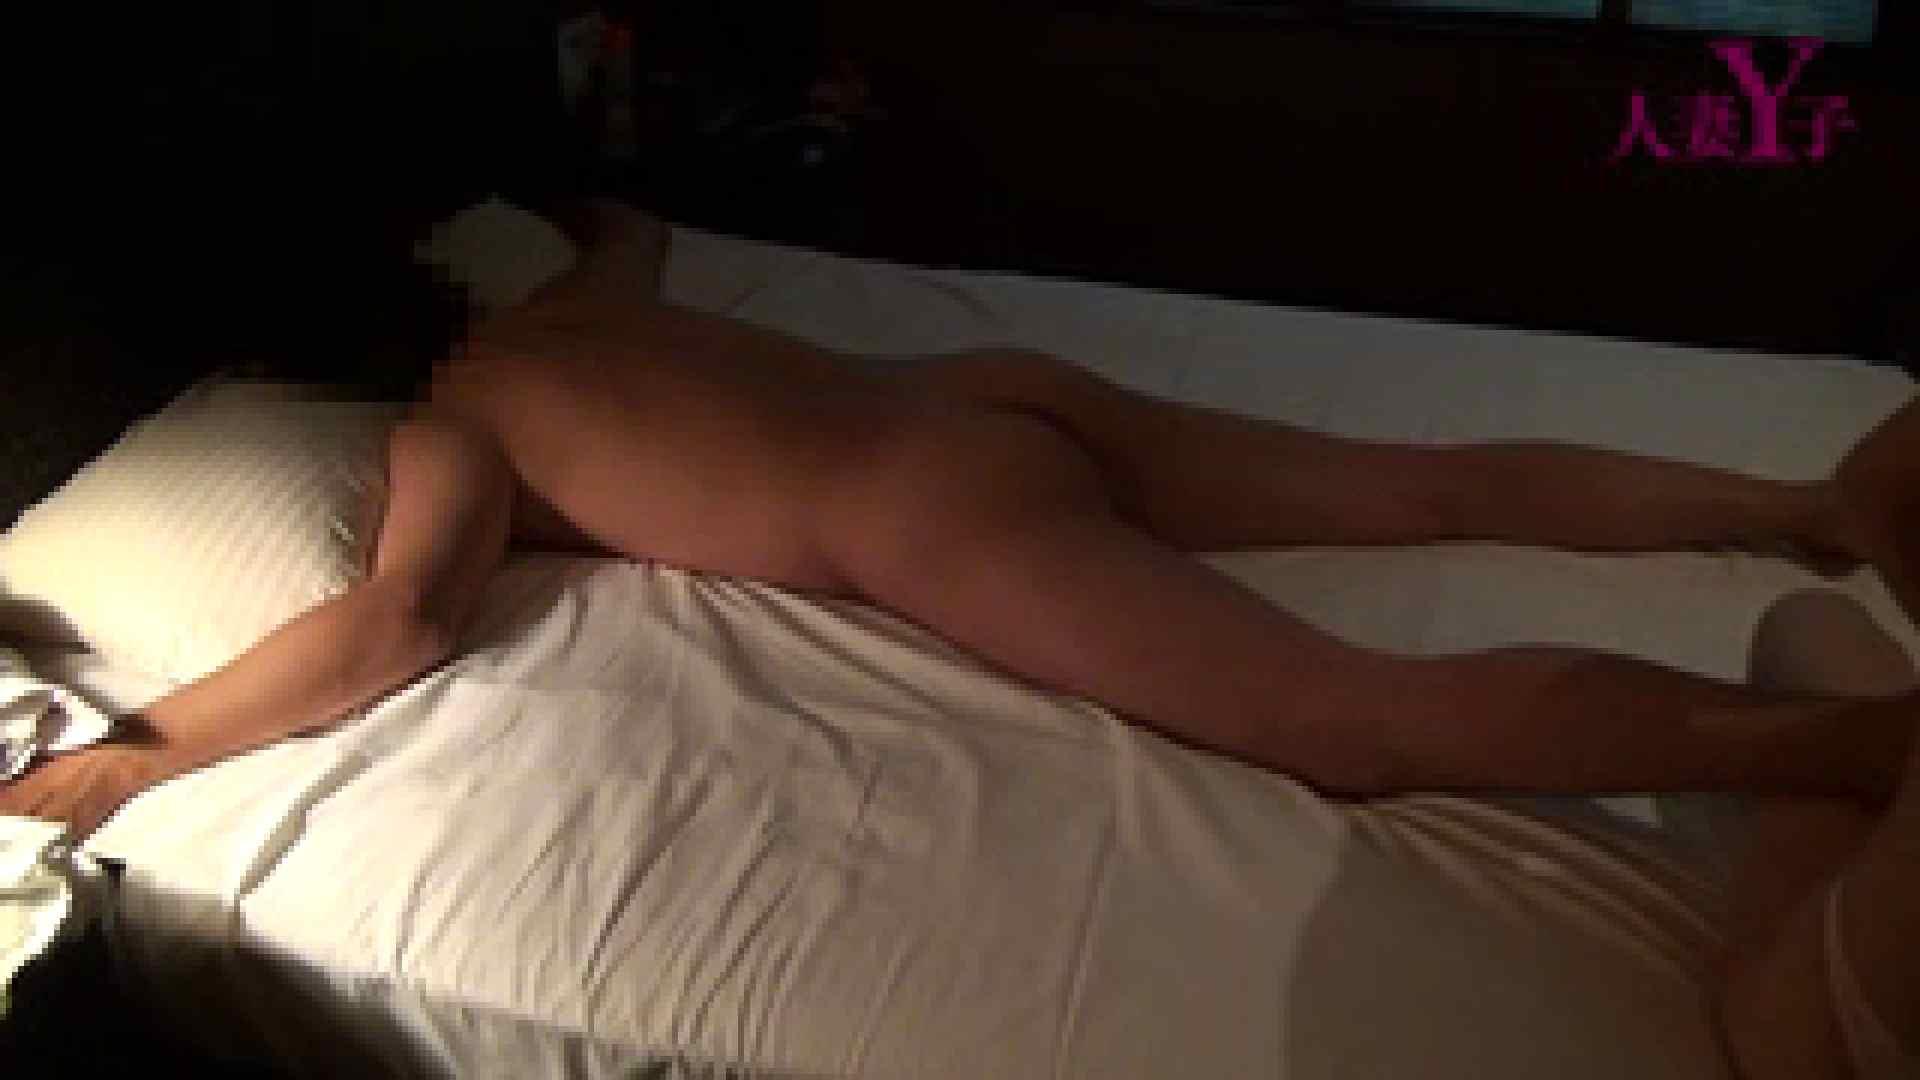 愛人Y子VOL.3 一般投稿 セックス無修正動画無料 92pic 91